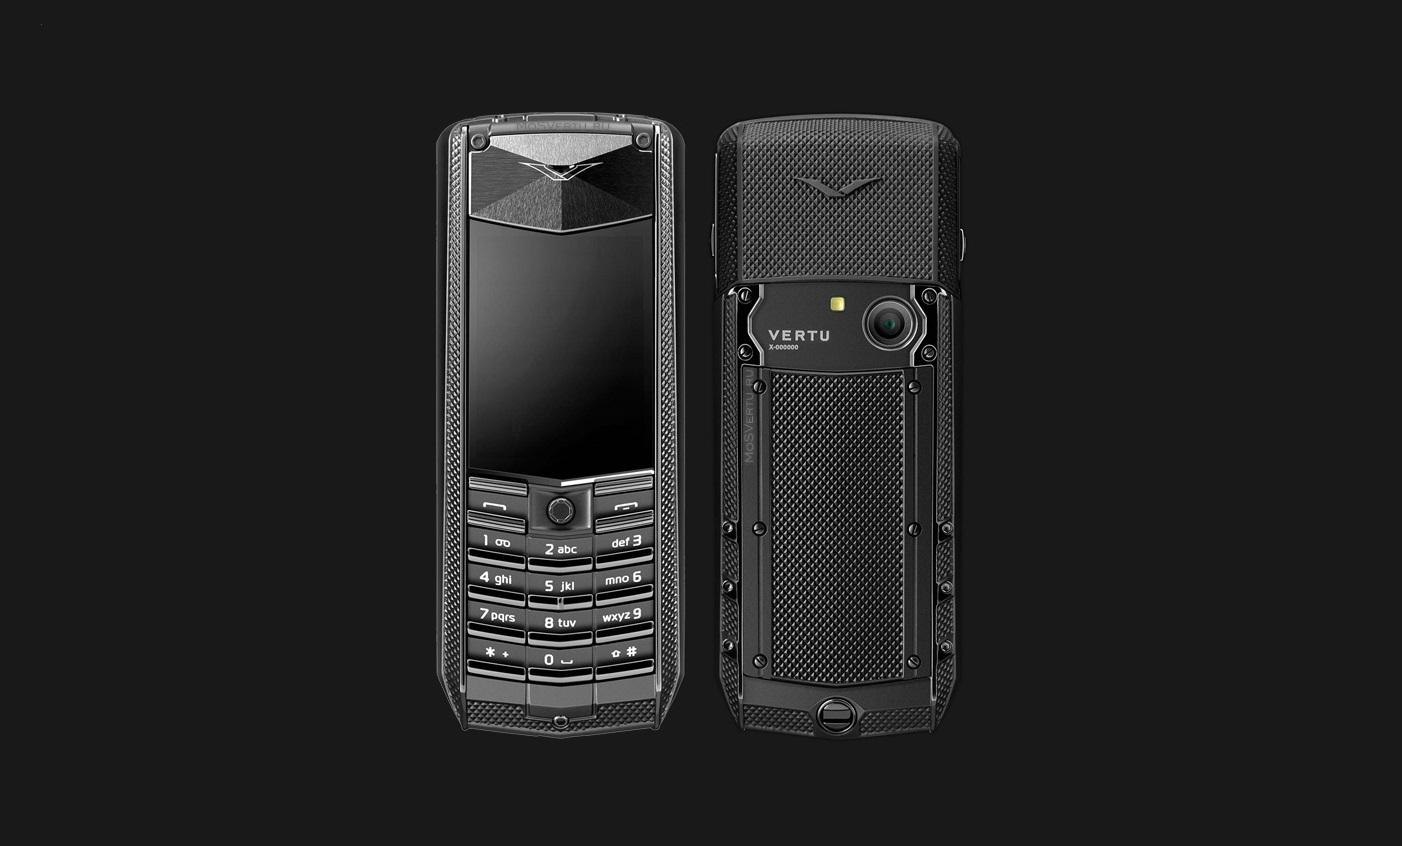 Vertu Ascent 2010 X Design RM-589V